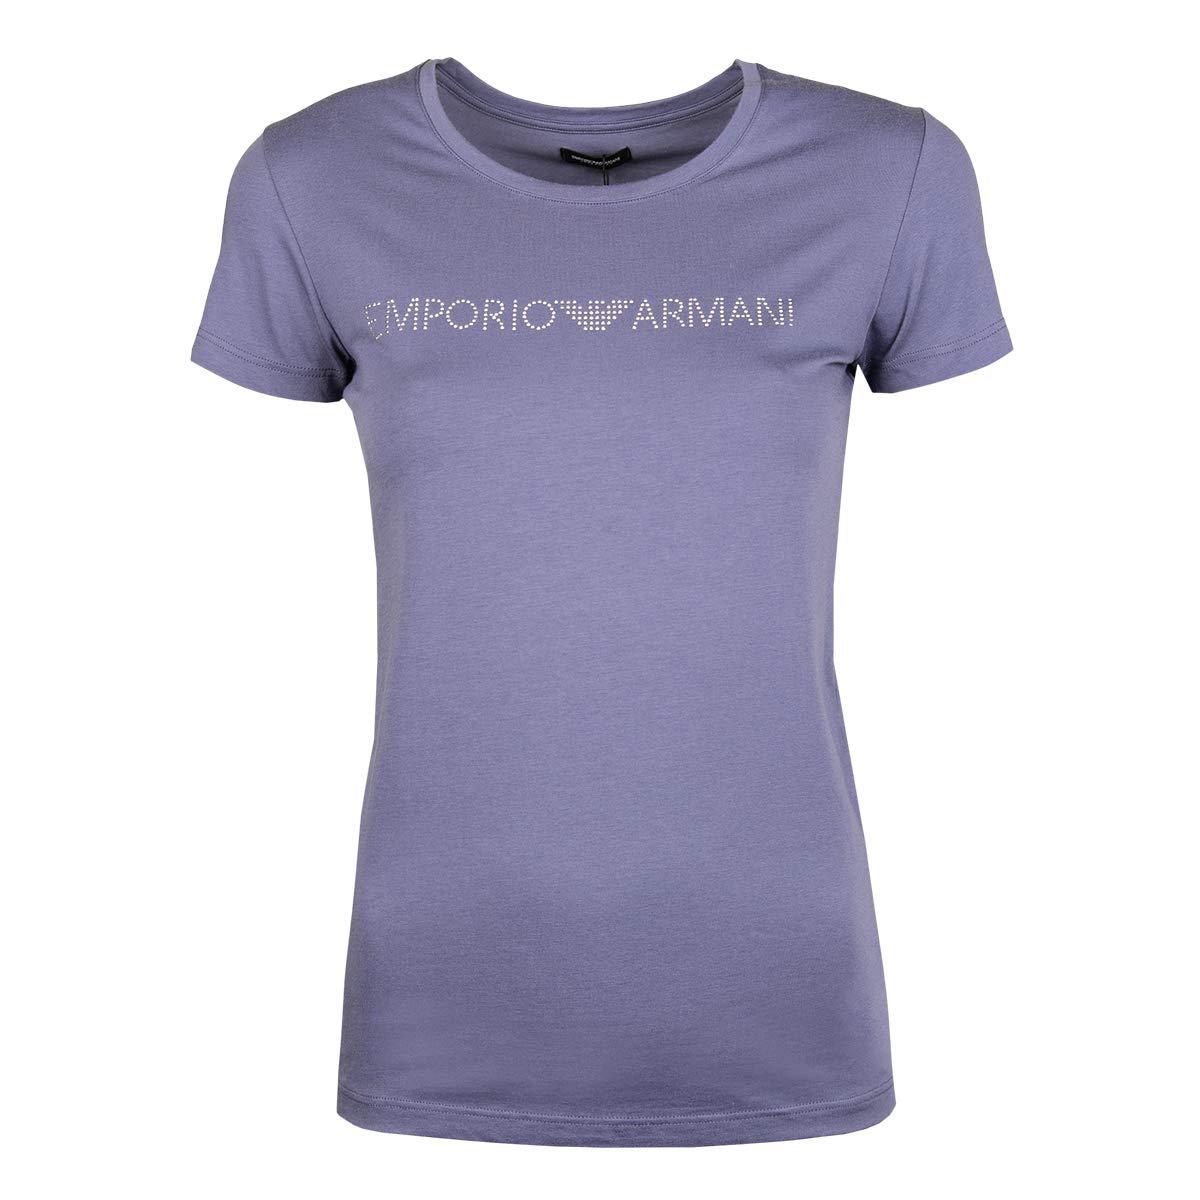 b802eb3e339e Emporio Armani T-Shirt Woman Short Sleeve Crew Neck Shirts Item 163139  8P263: Amazon.co.uk: Clothing